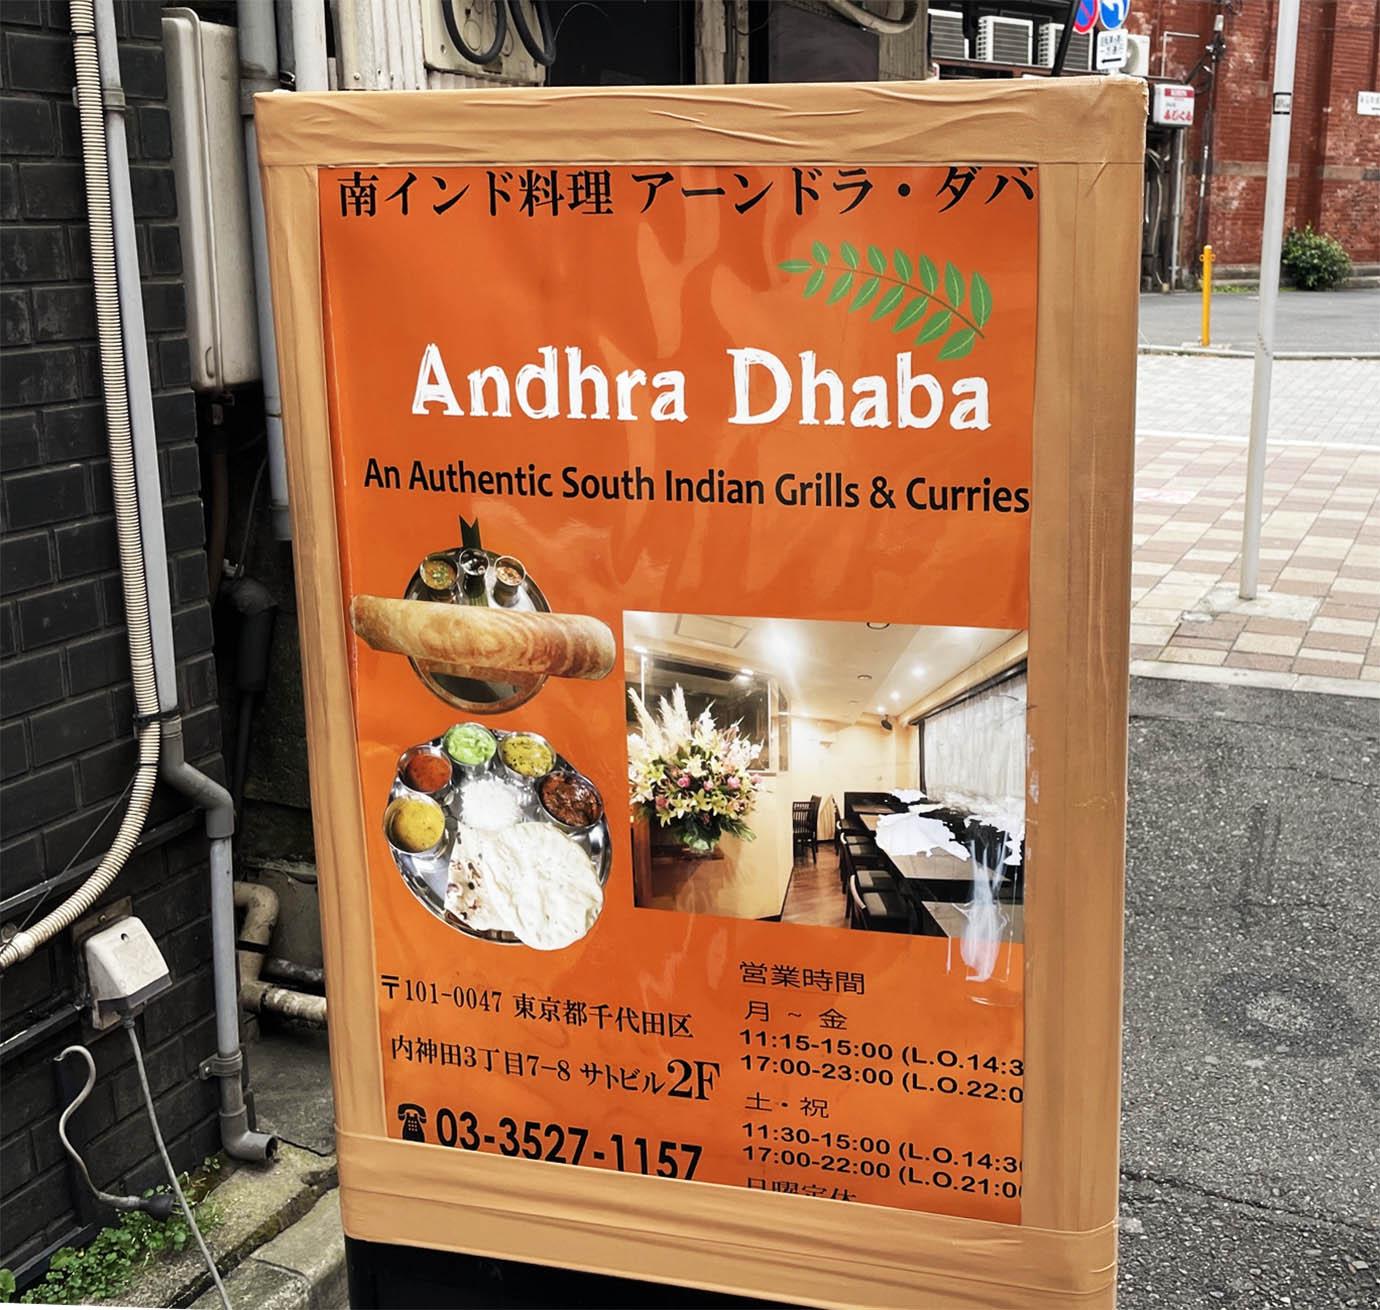 andhra-dhaba-onion-pesarattu7